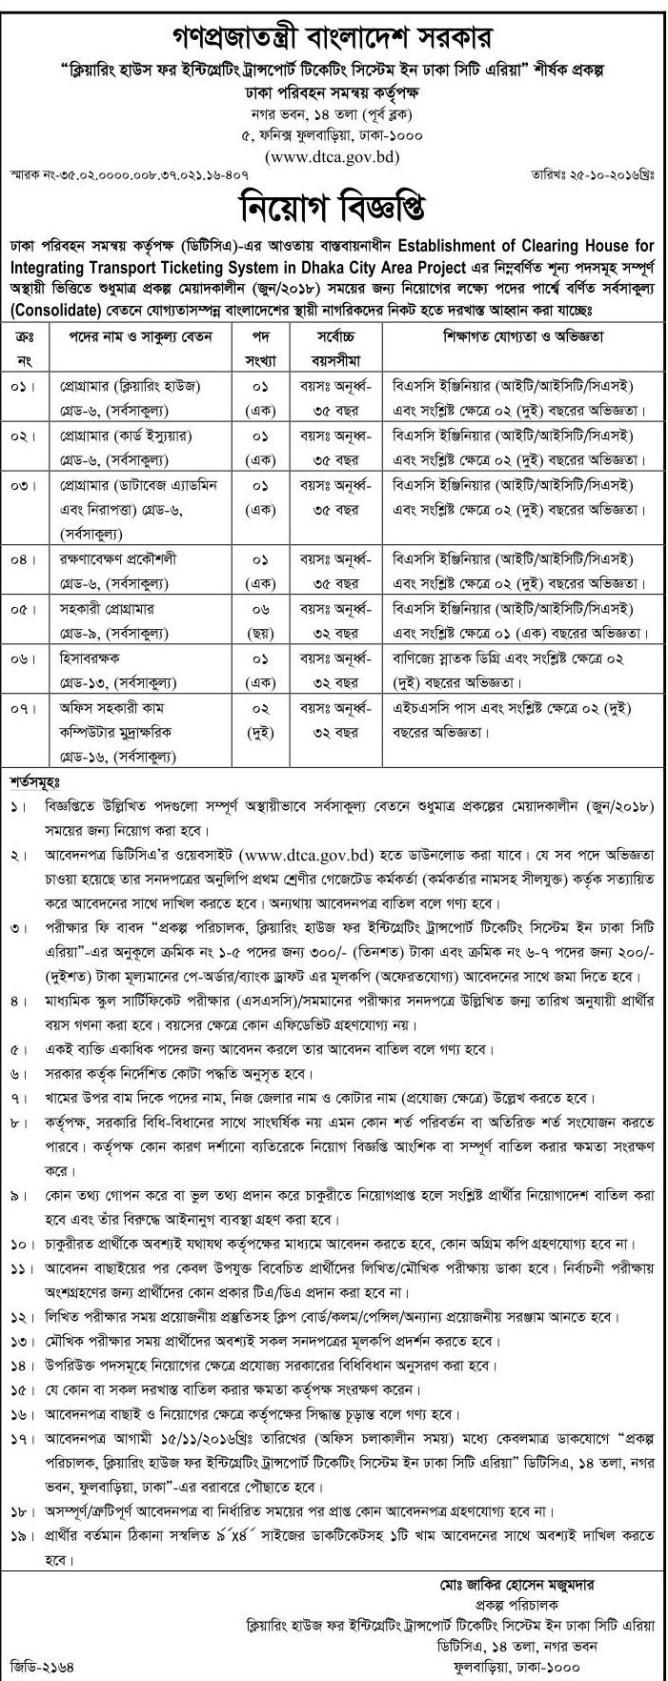 DTCA Govt Job Circular 2016